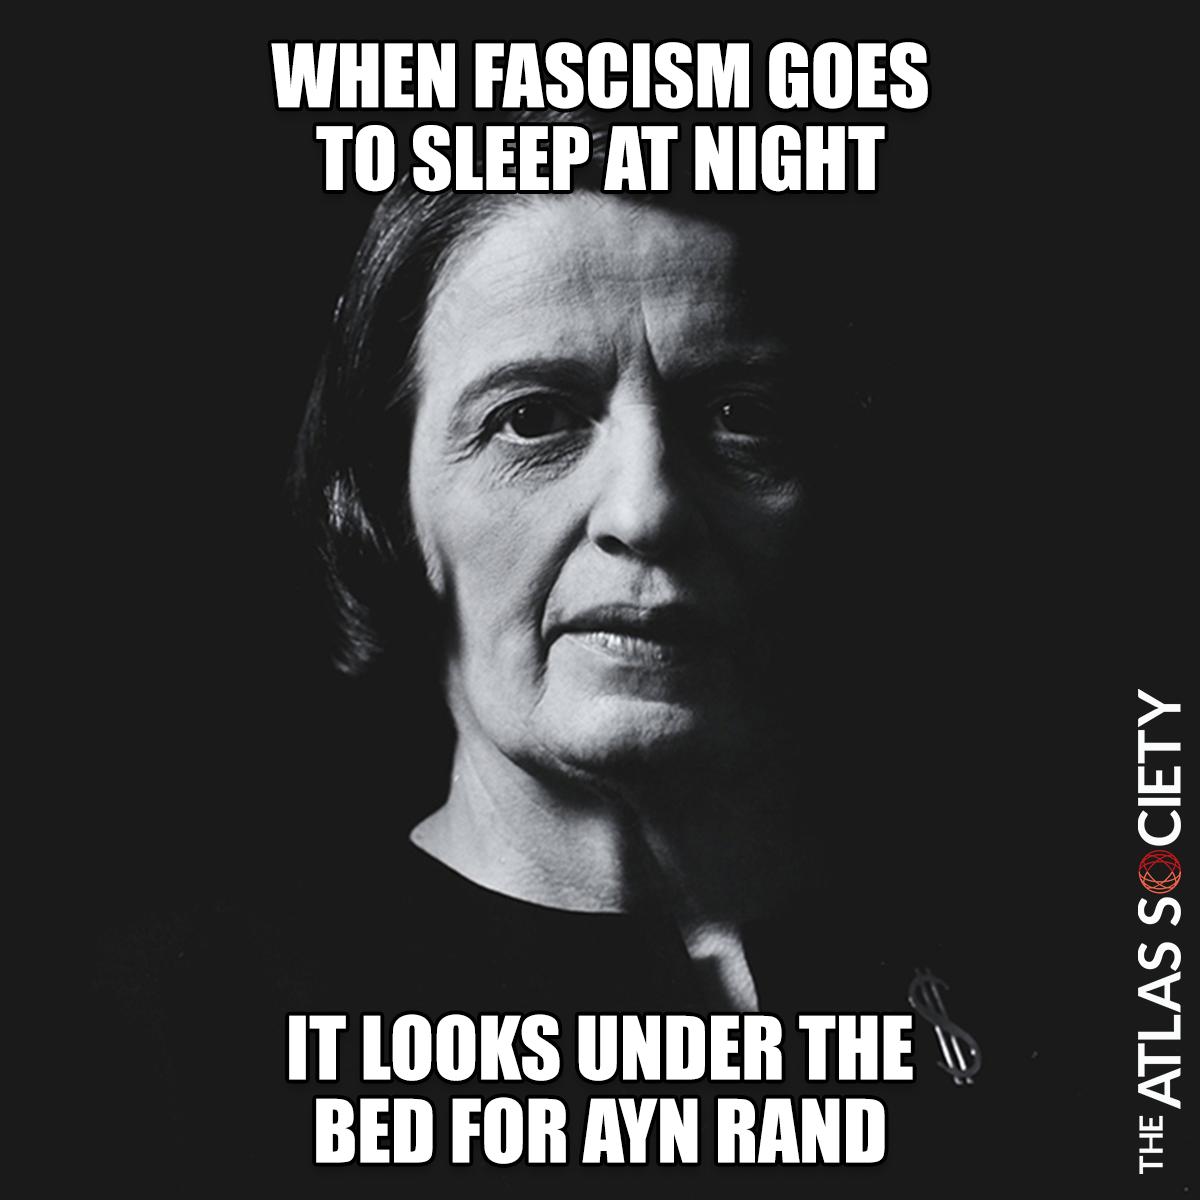 The Atlas Societys Tweet Fascism Communism Are Both Rooted In